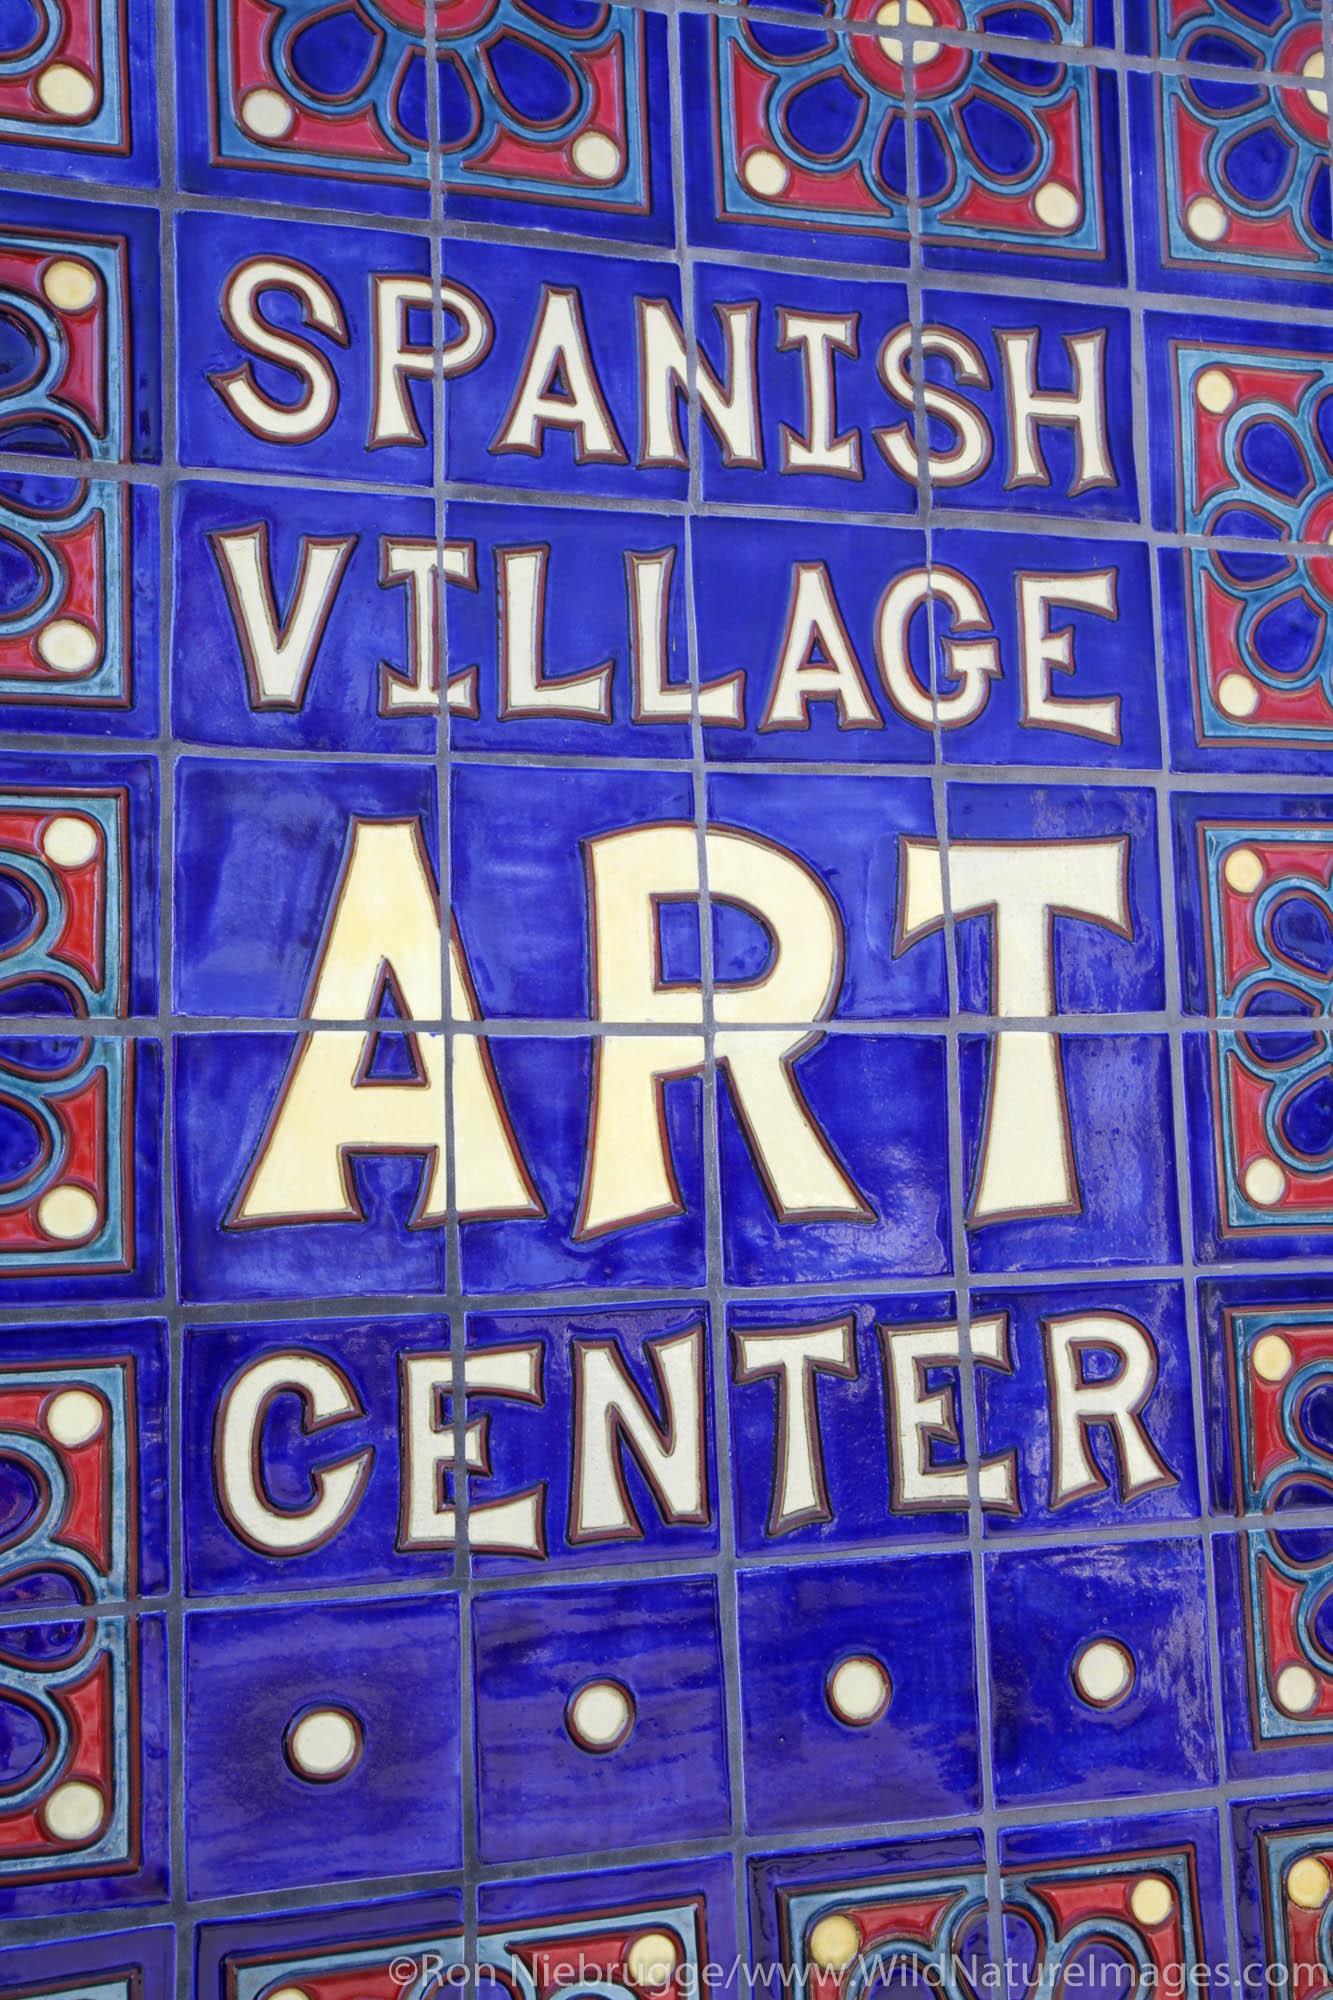 The Spanish Village Art Center, Balboa Park, San Diego, California.